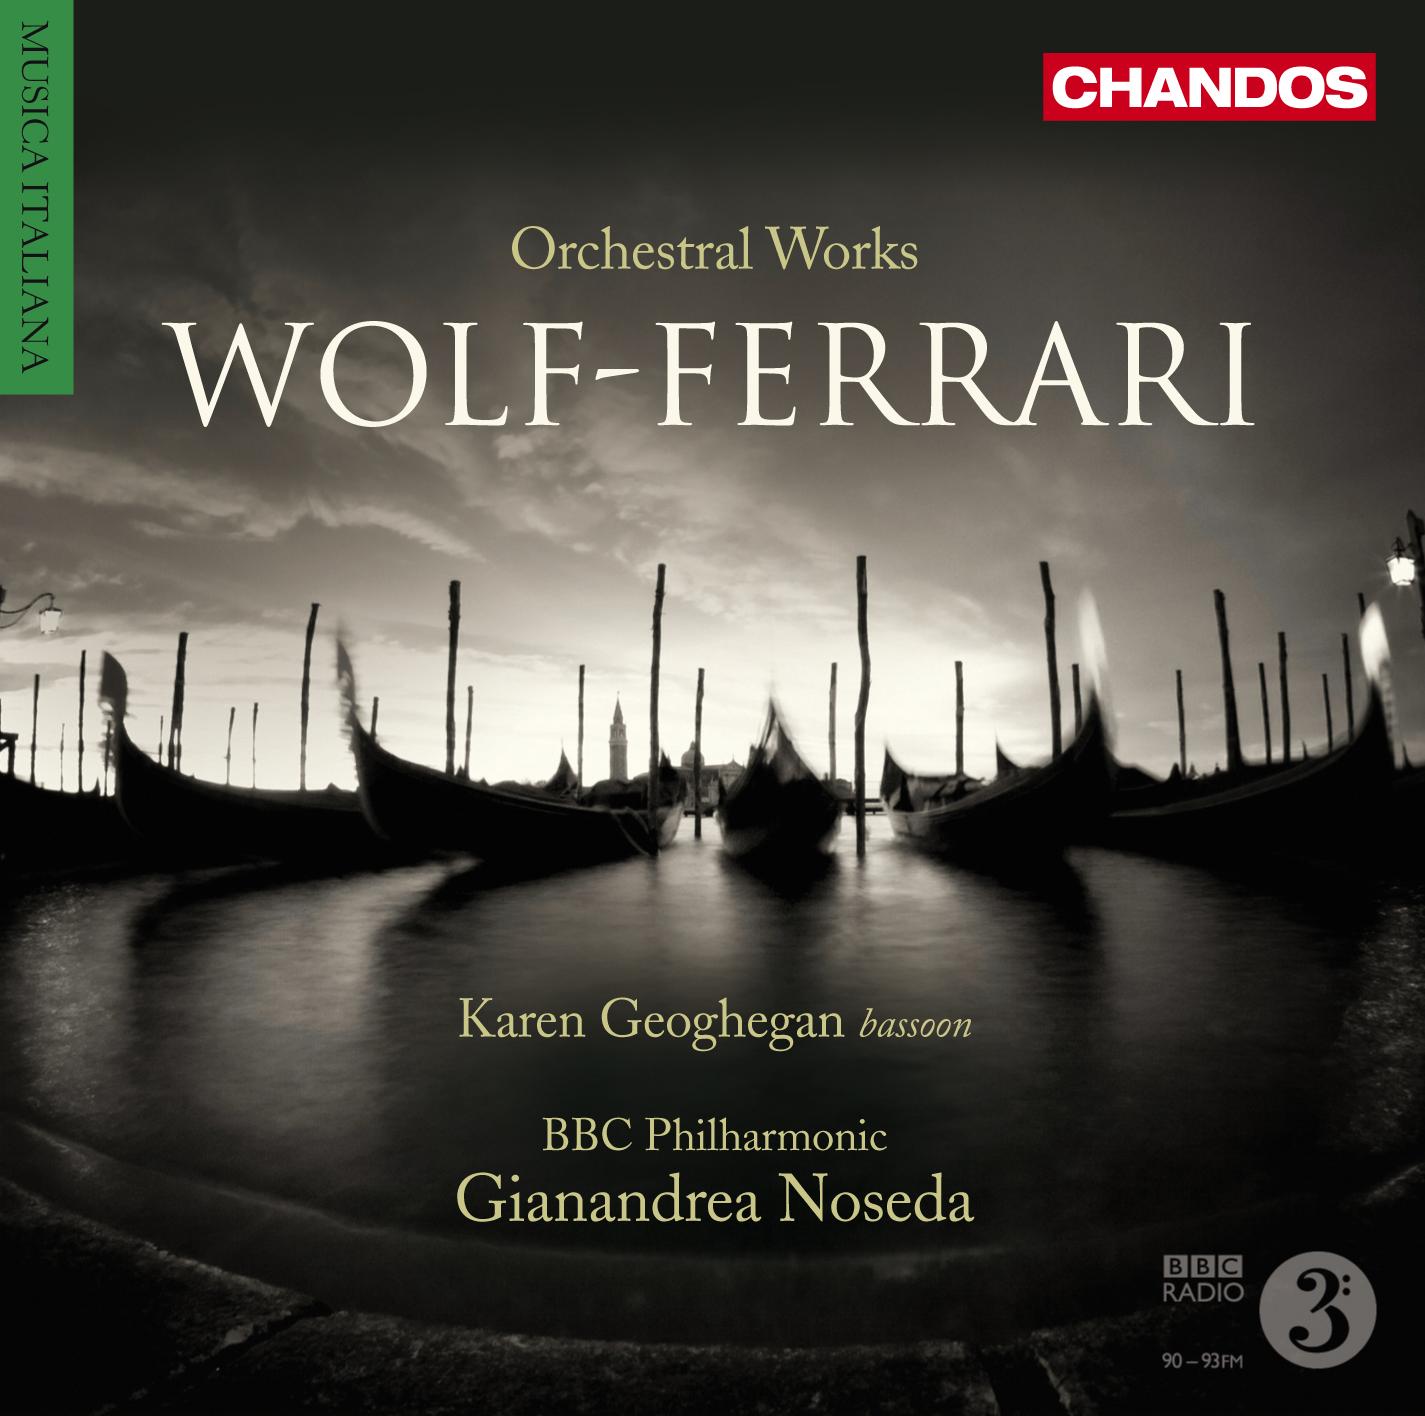 Ermanno Wolf-Ferrari Frontpmn